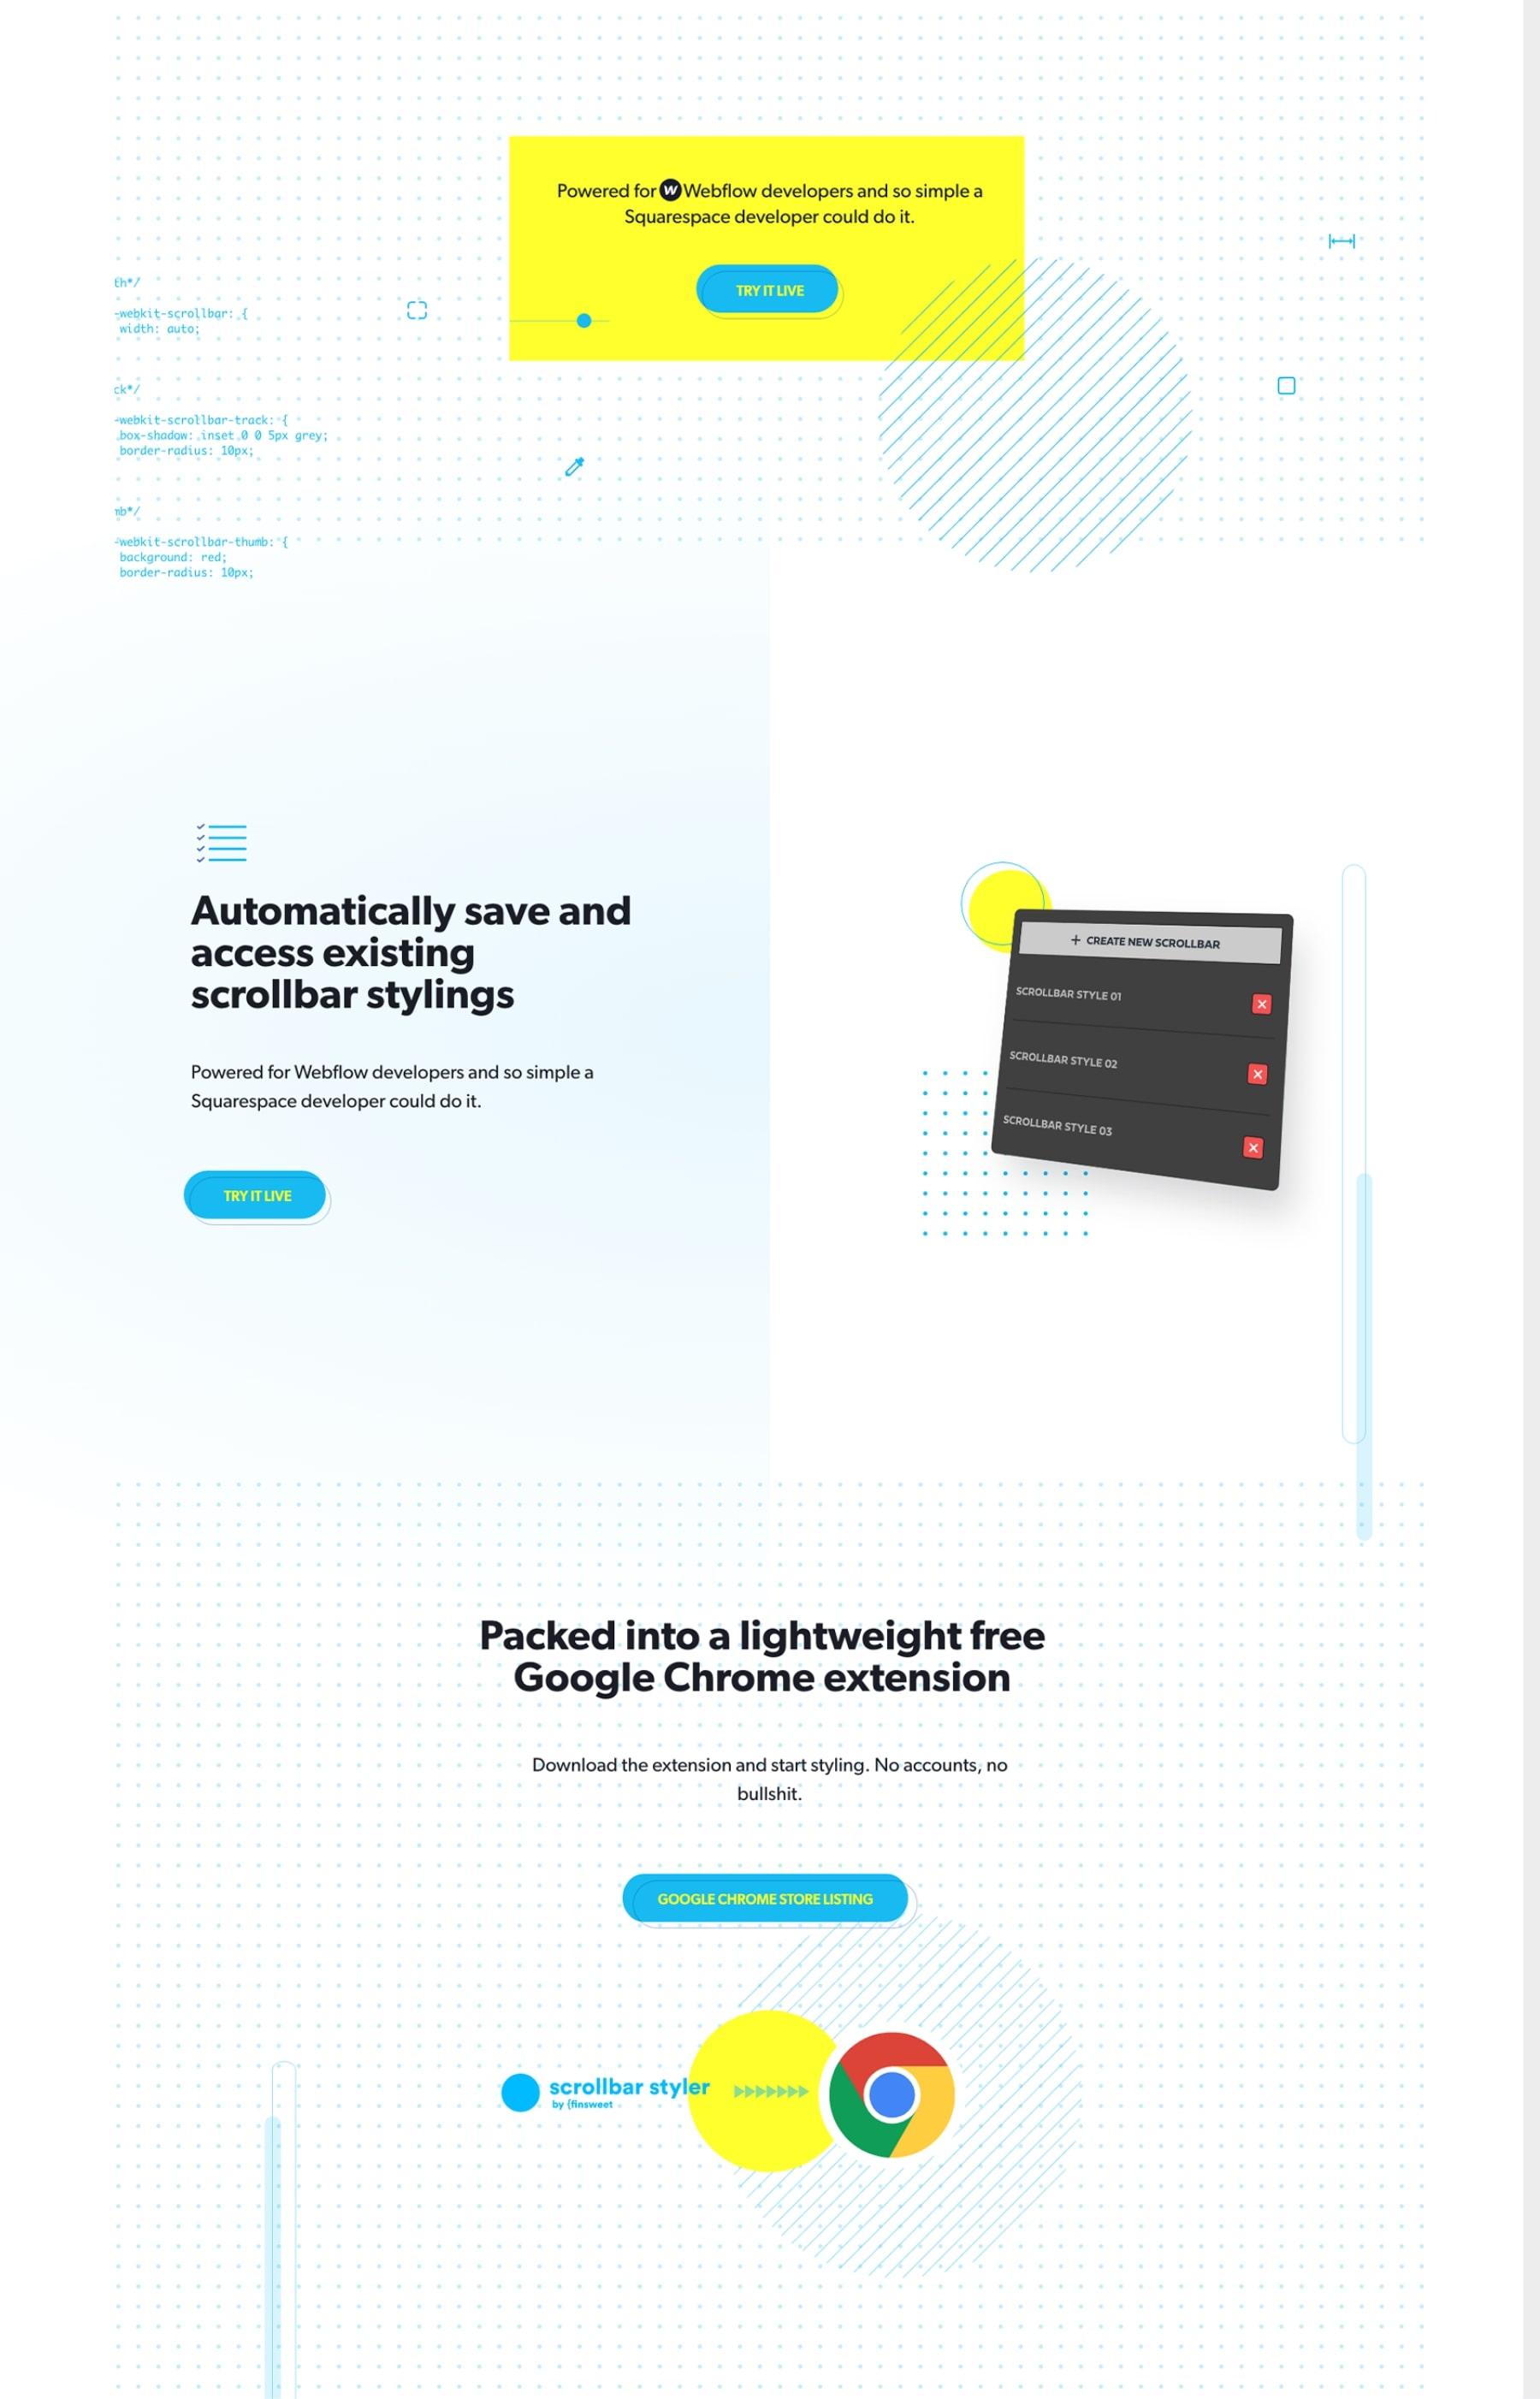 Diseño web de la homepage de Finsweet Scrollbar Styler por El Patio Webflow Studio.